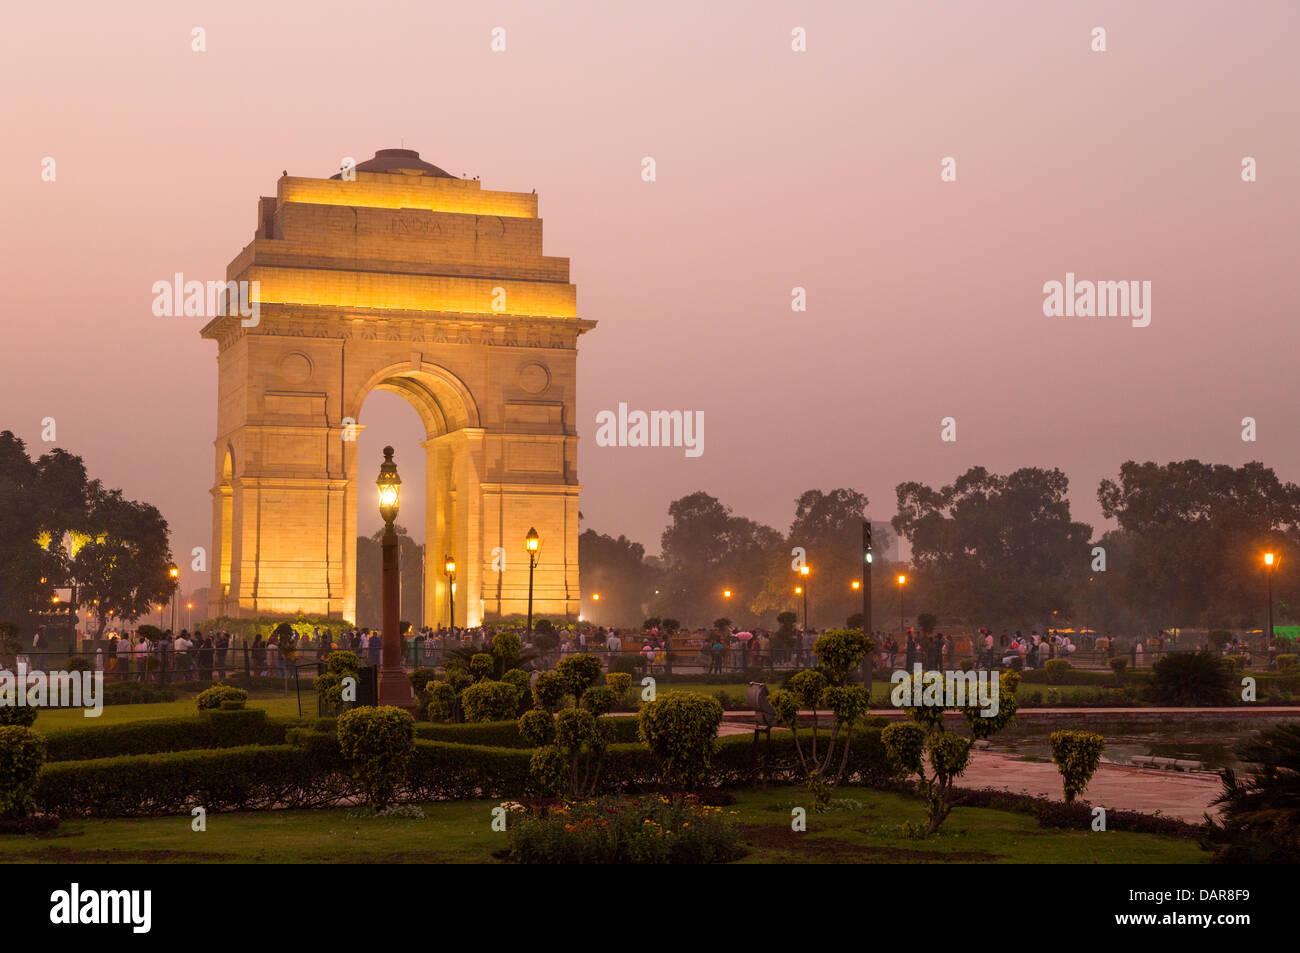 India, Uttar Pradesh, New Delhi, India Gate illuminated at twilight - Stock Image